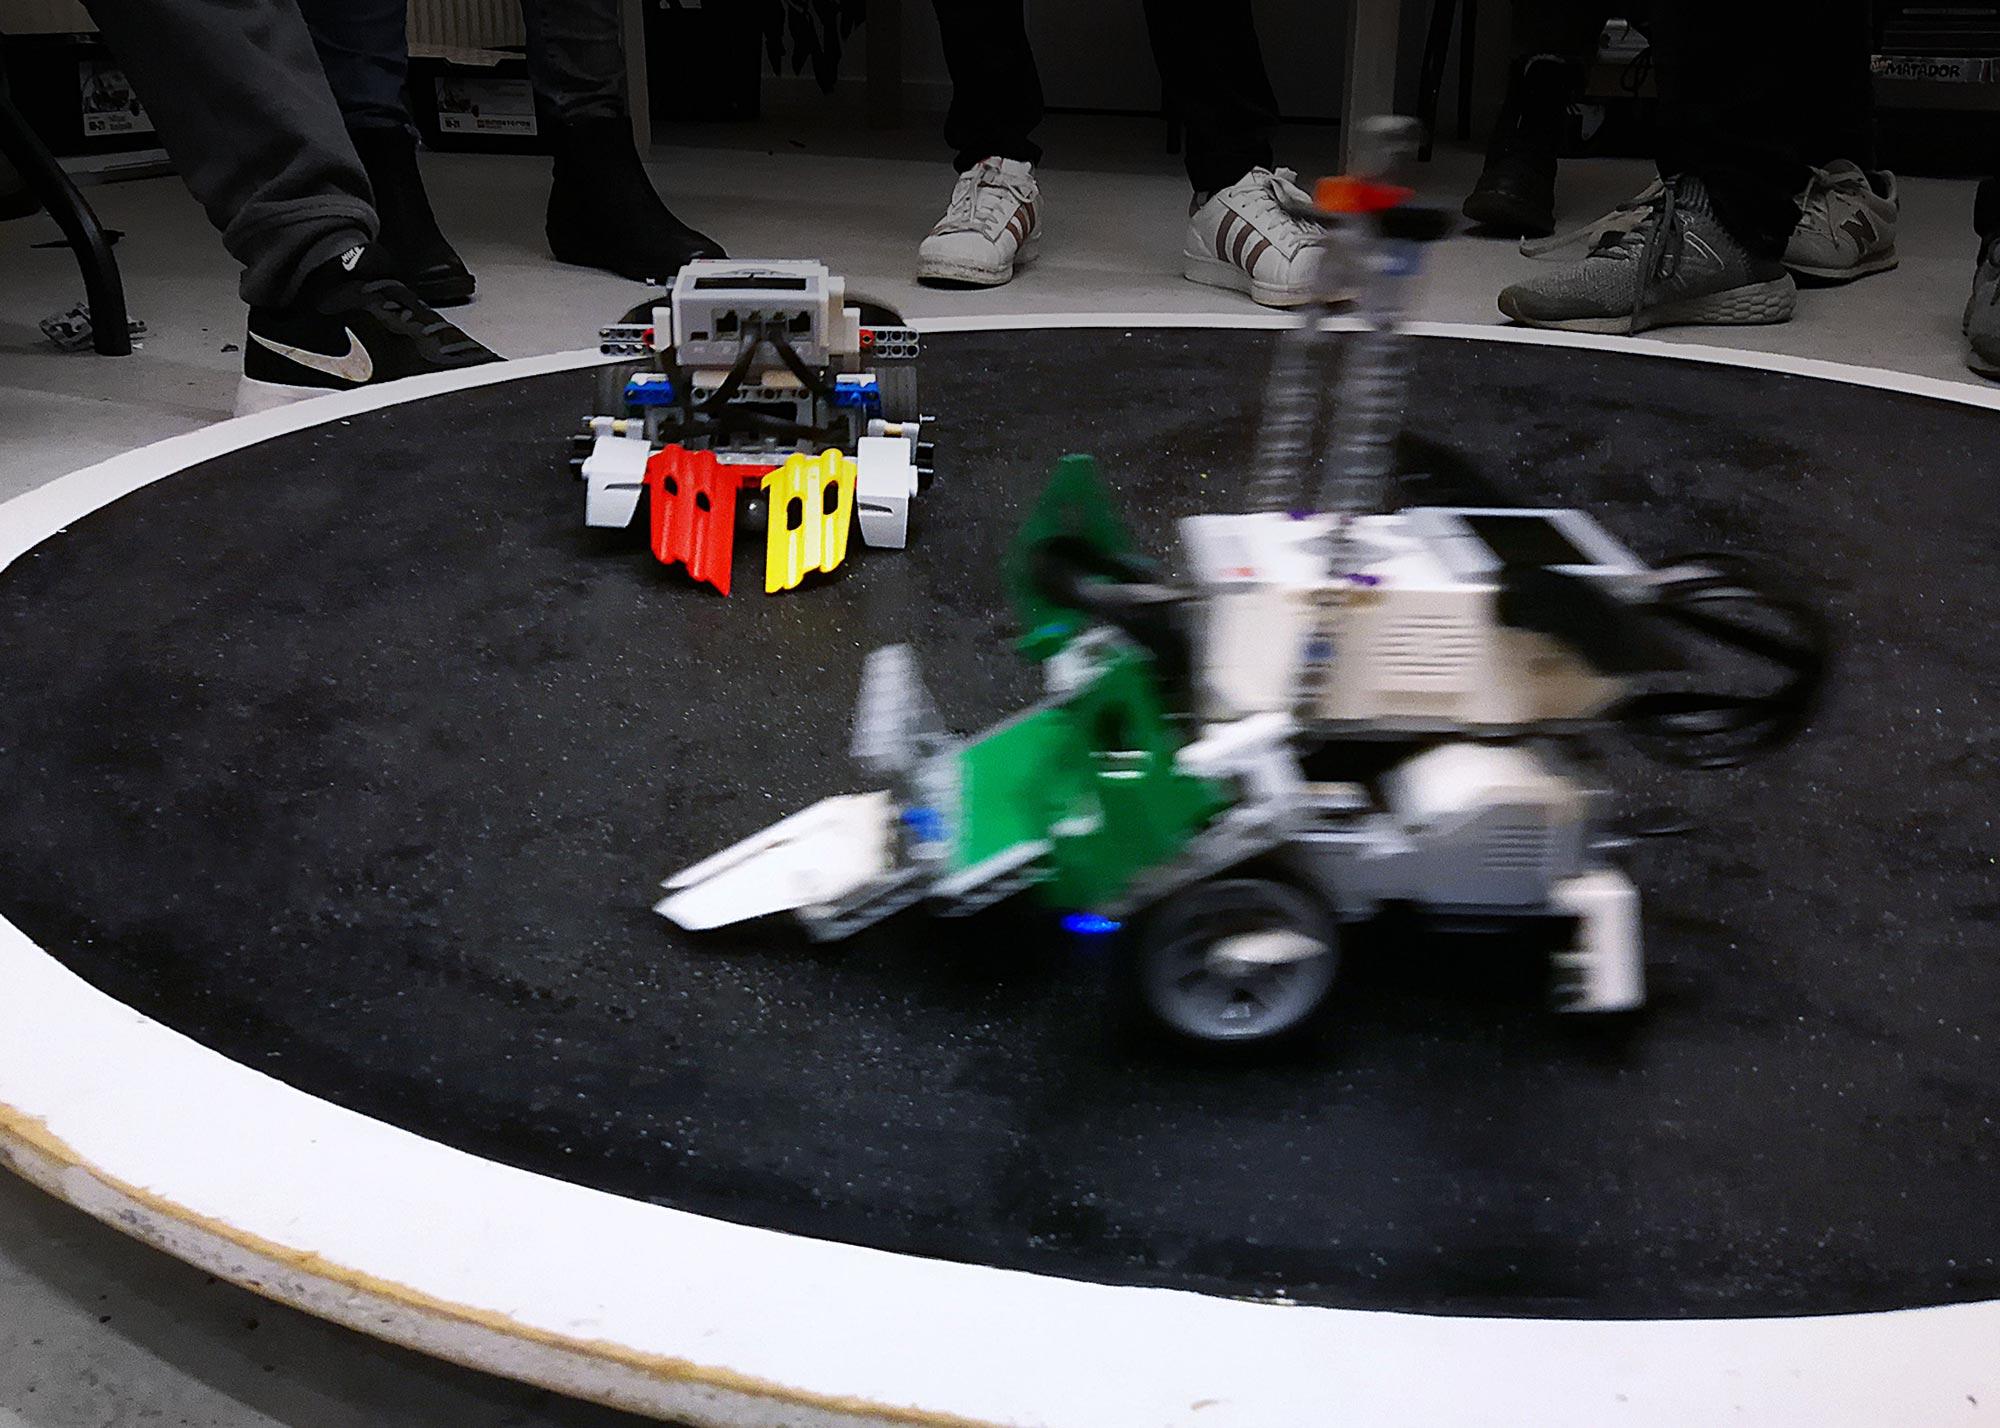 Robotsumobrydning på Kids City Lab